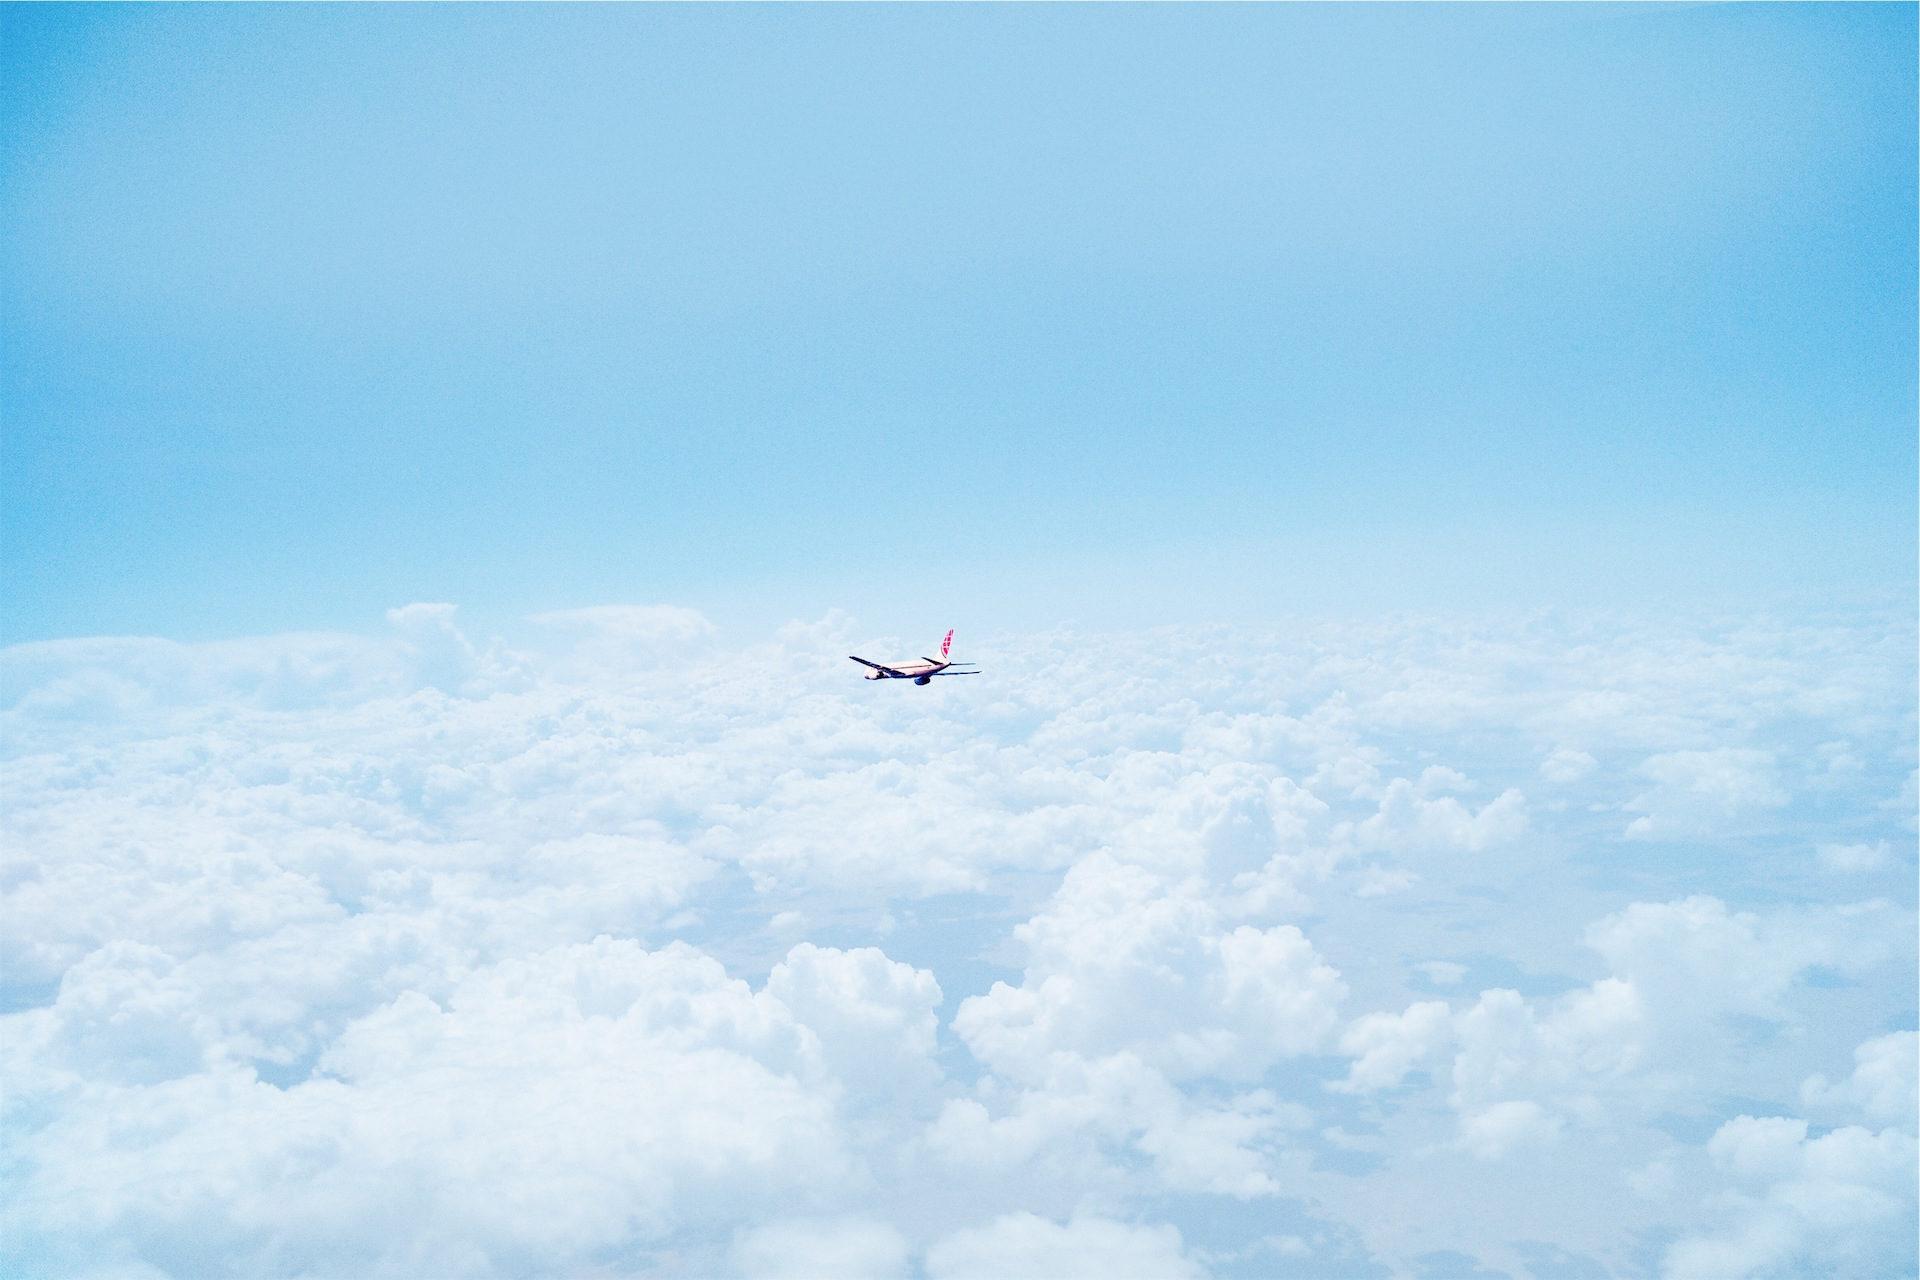 Flugzeug, Luft, Wolken, Himmel, Blau - Wallpaper HD - Prof.-falken.com